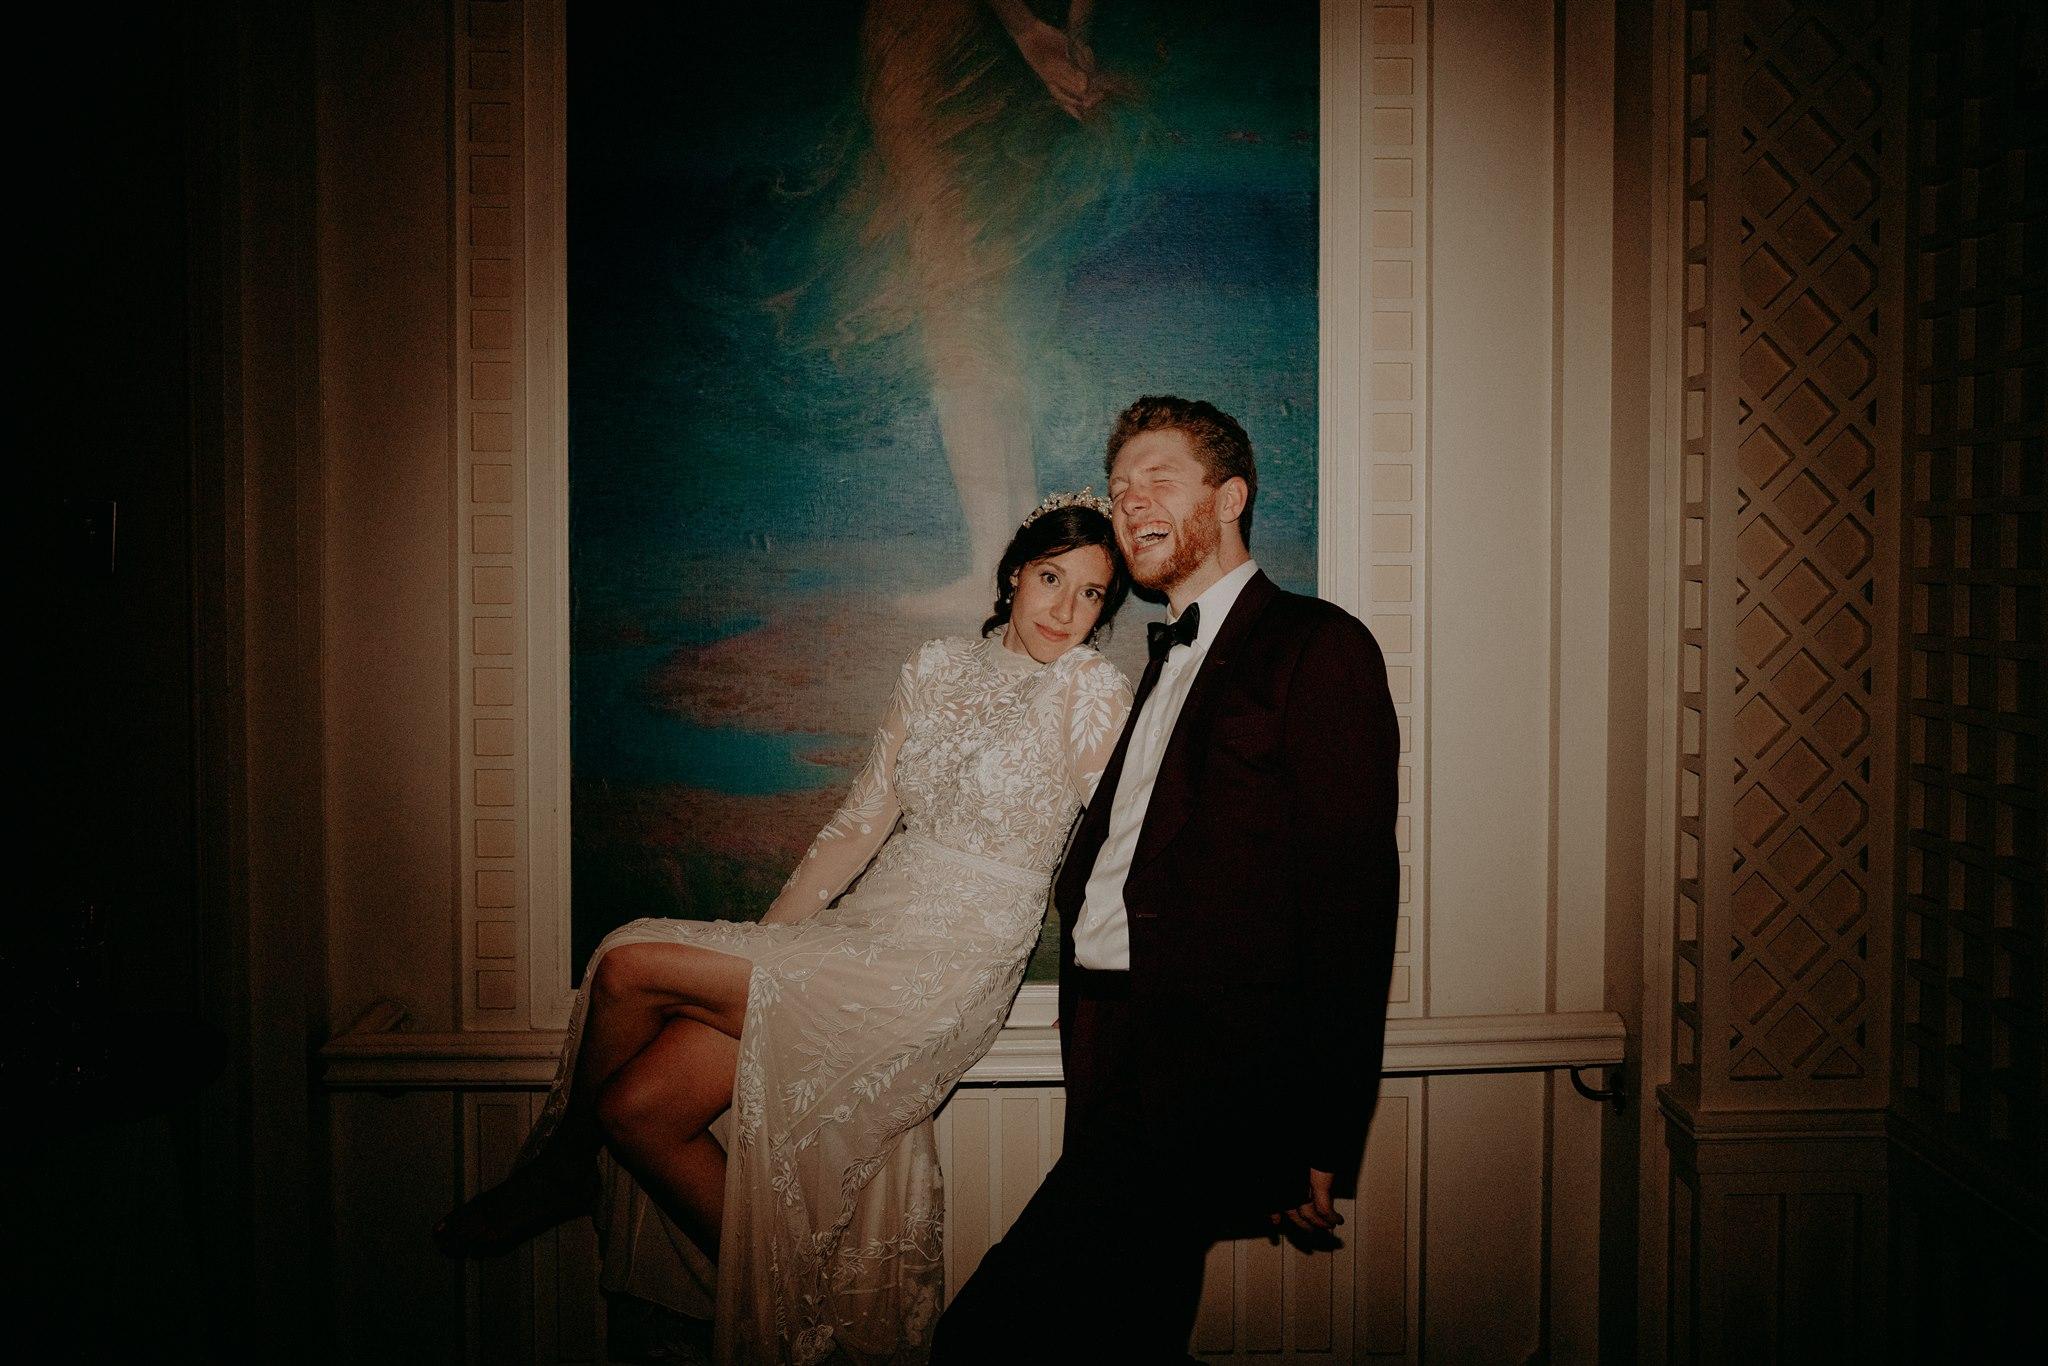 Chellise_Michael_Photography_Hudson_Valley_Wedding_Photographer_Otesaga_Hotel-6282.jpg